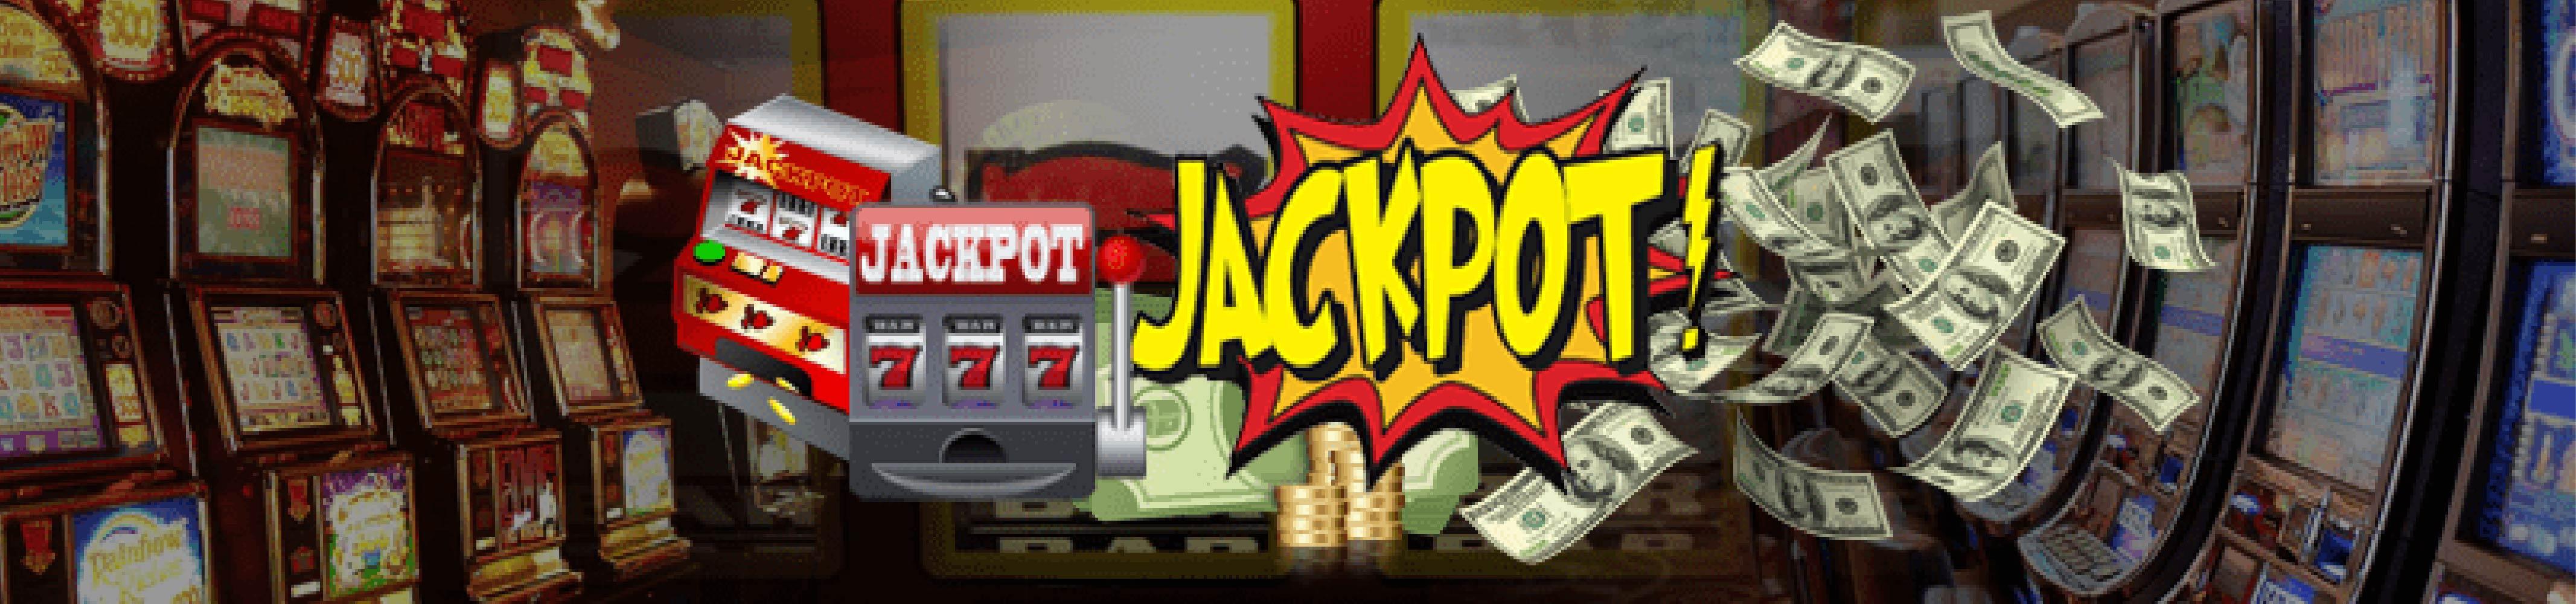 Bermain Slot games dengan Progresif